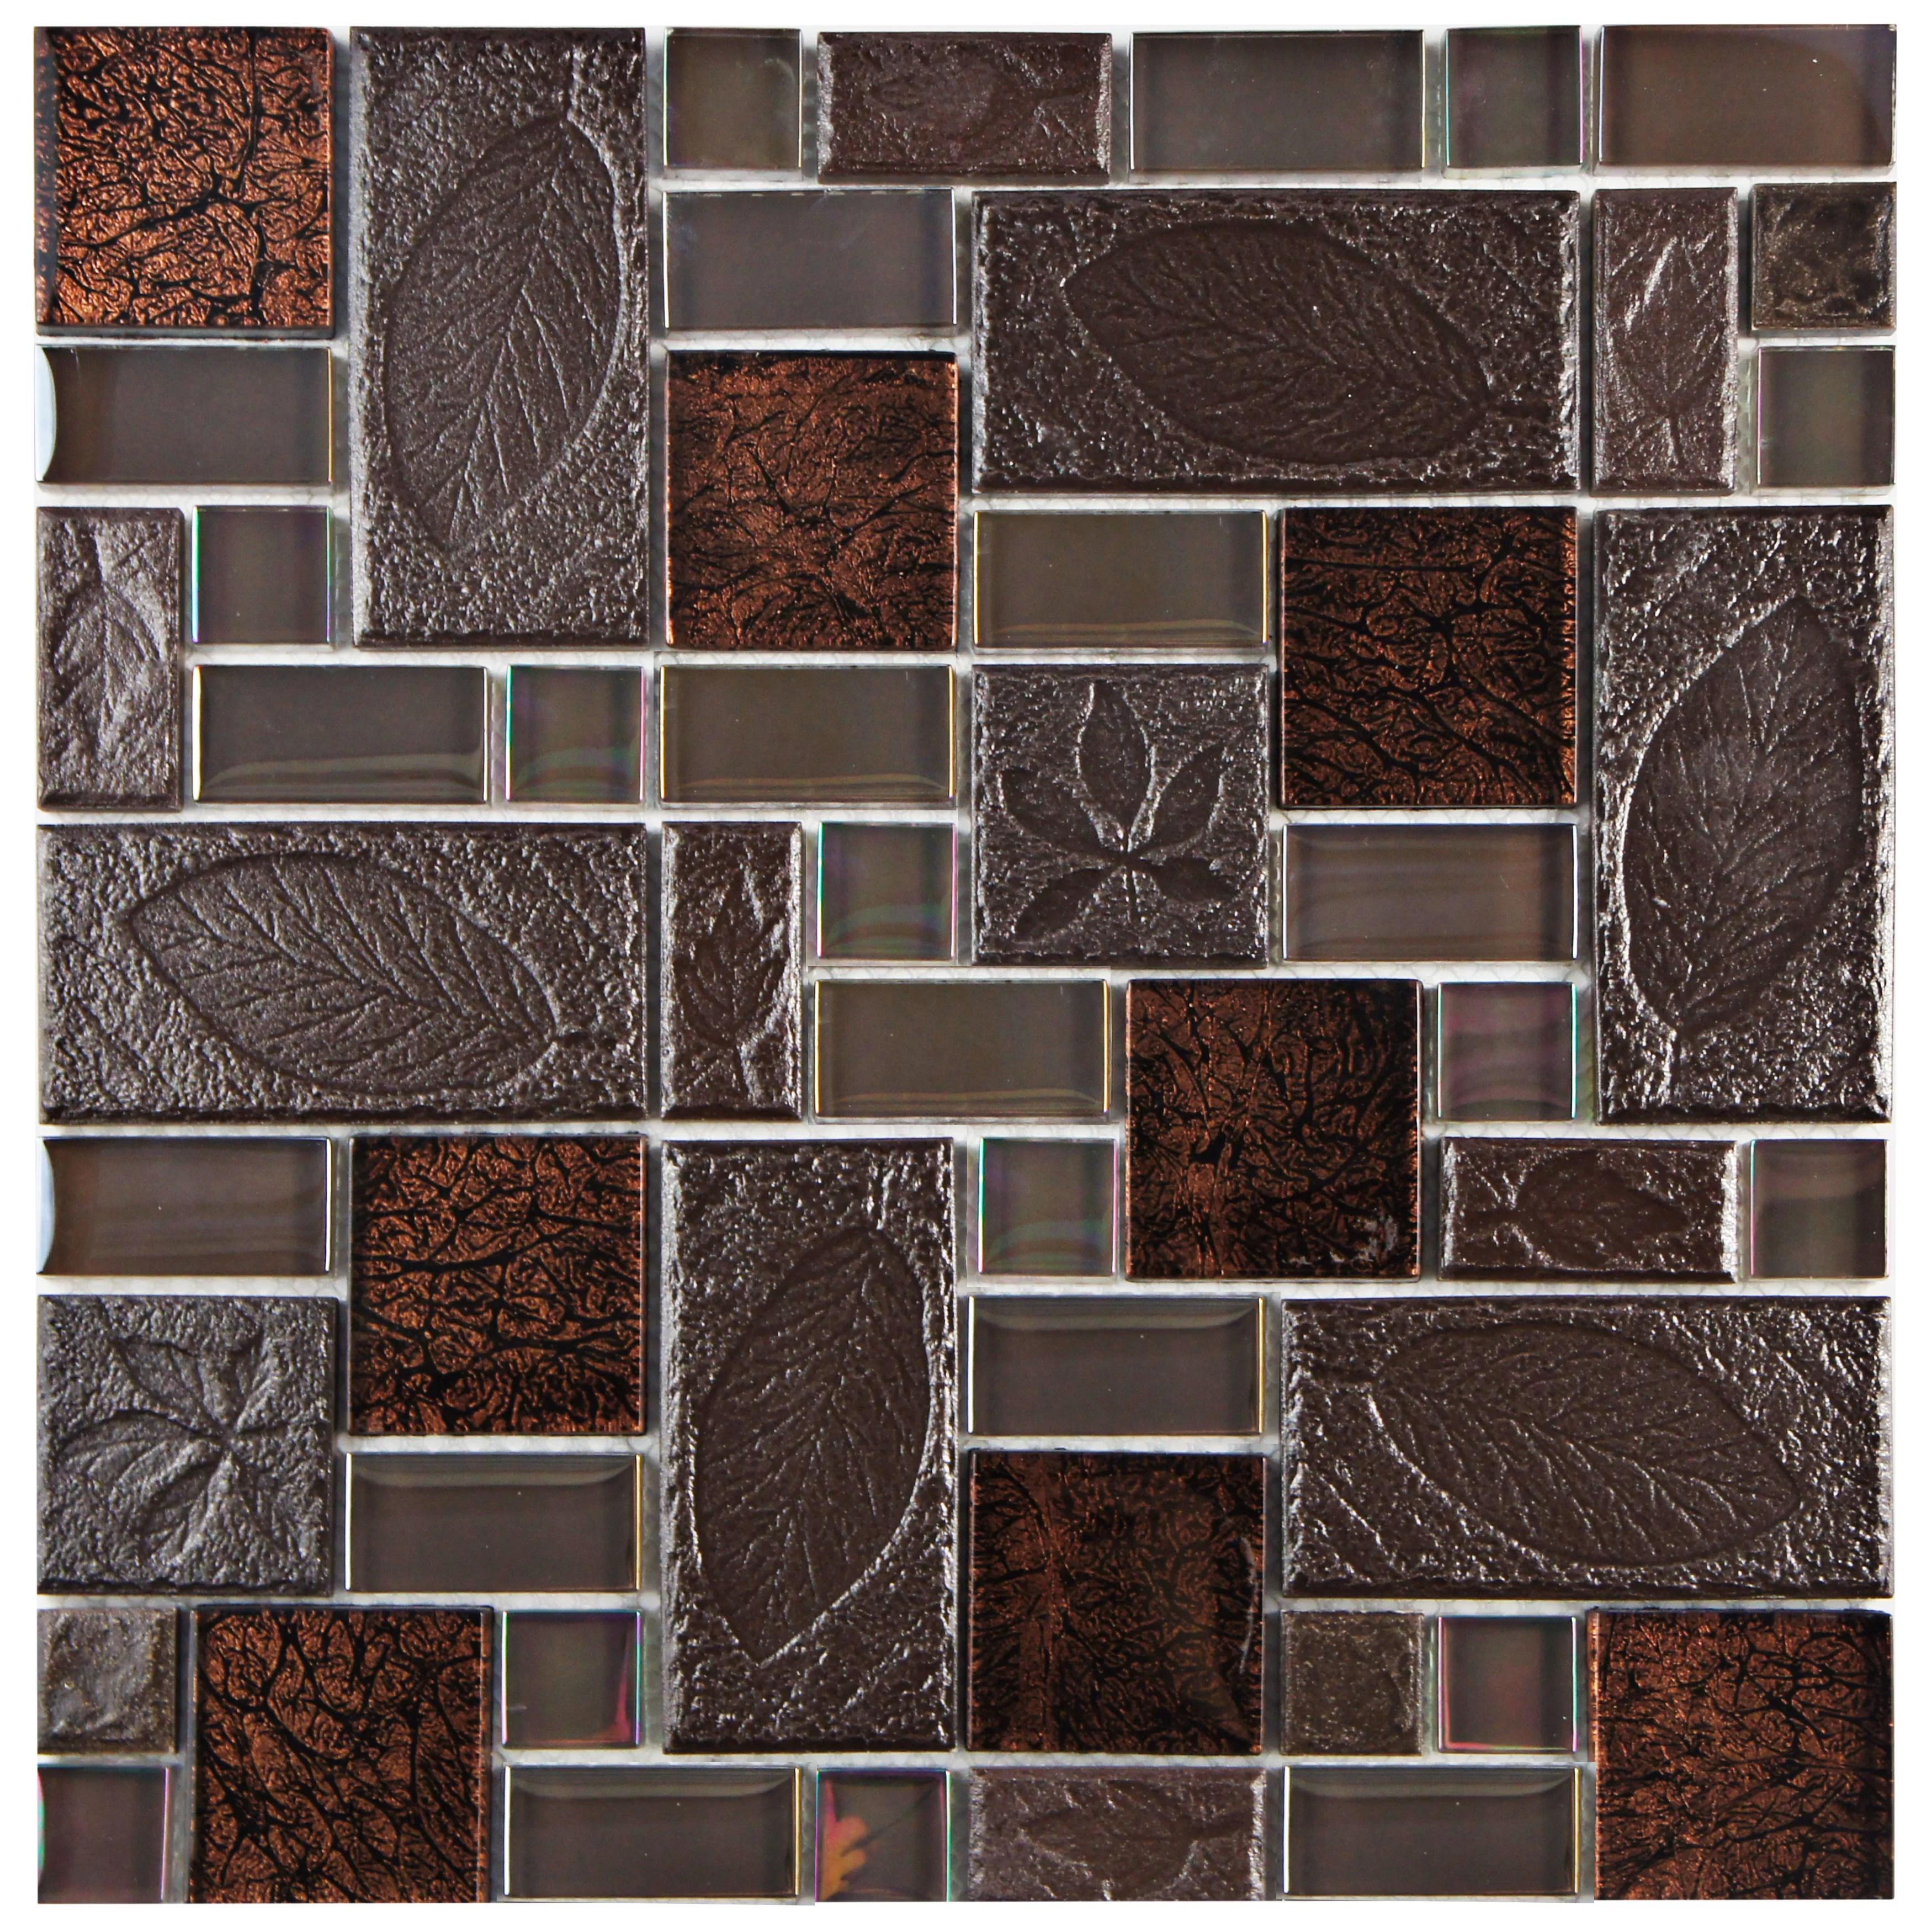 "Elitetile Eden 1175"" X 1175"" Glass And Stone Mosaic Tile"